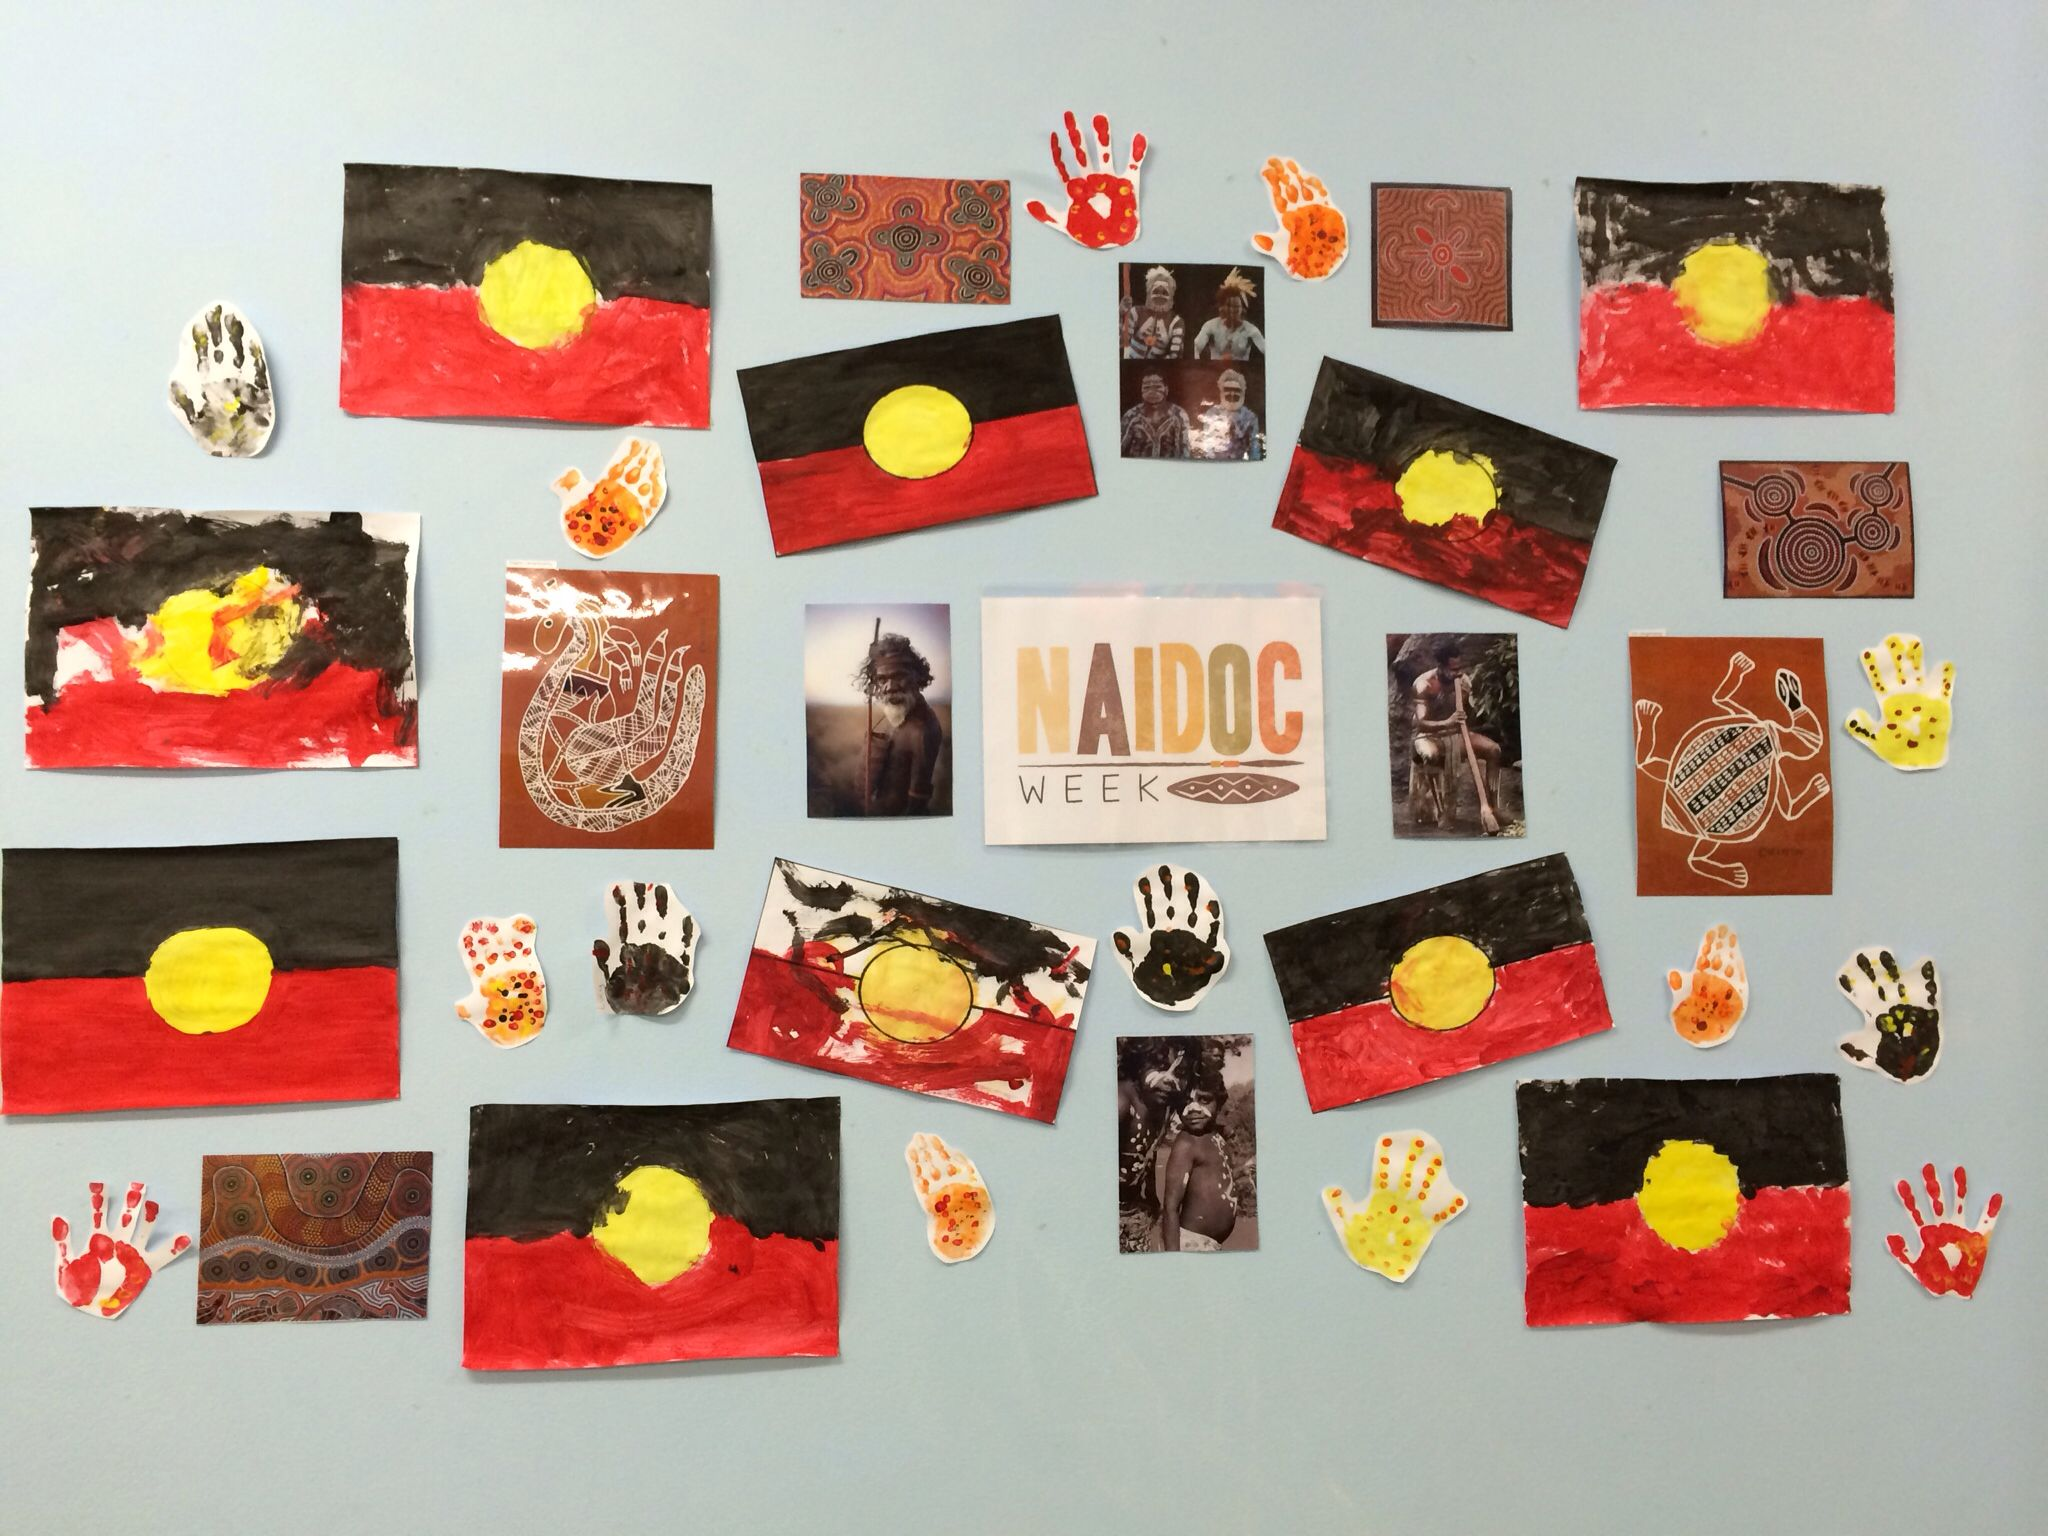 Naidoc Preschool Room Display Celebration